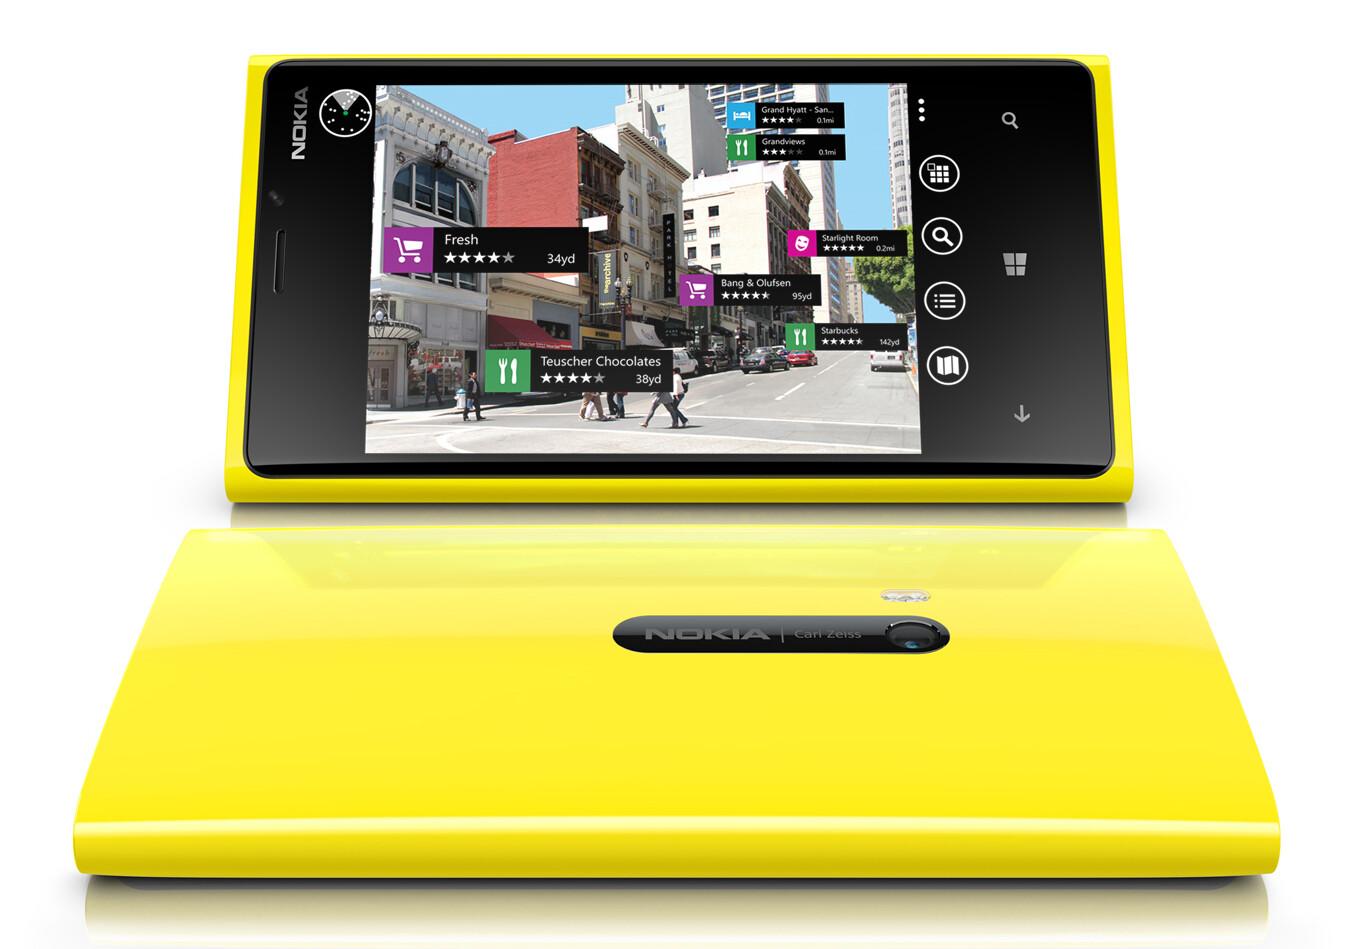 nokia lumia 920 specs. Black Bedroom Furniture Sets. Home Design Ideas